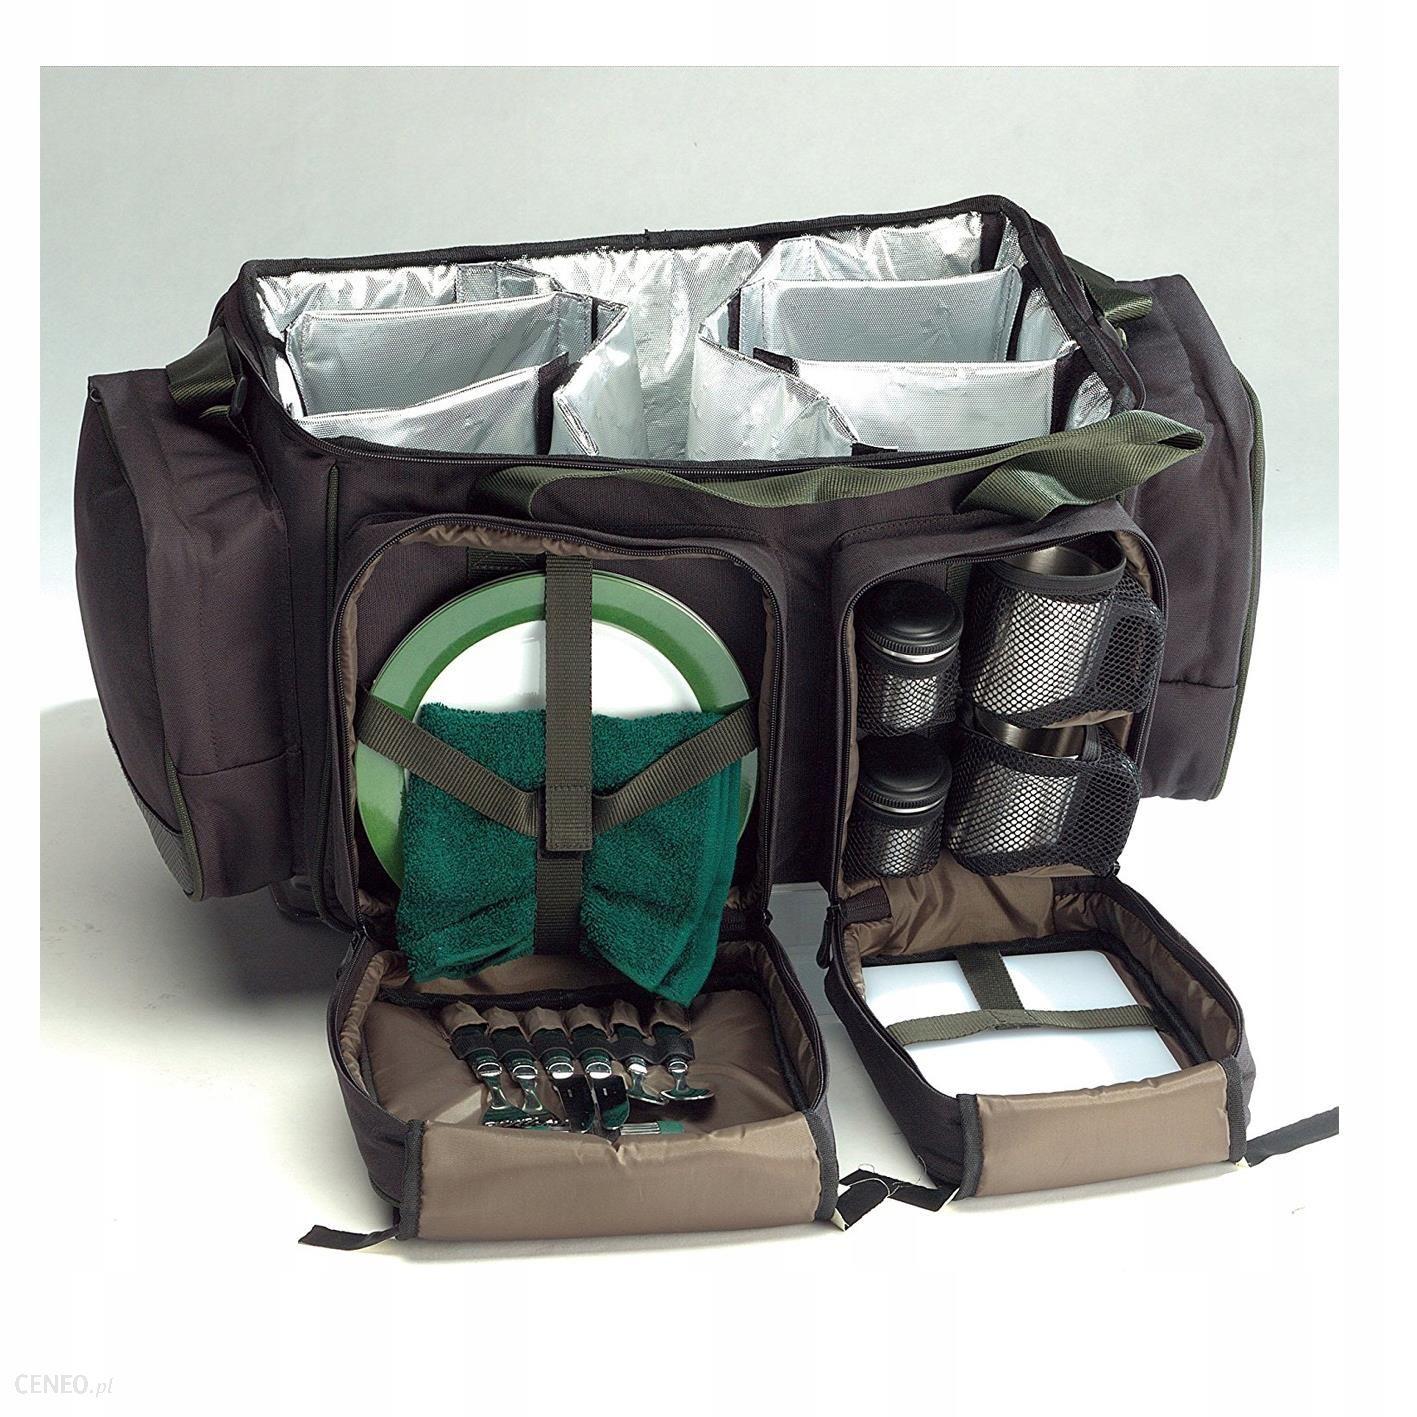 Torba Anaconda Carp Survival Bag 7142010